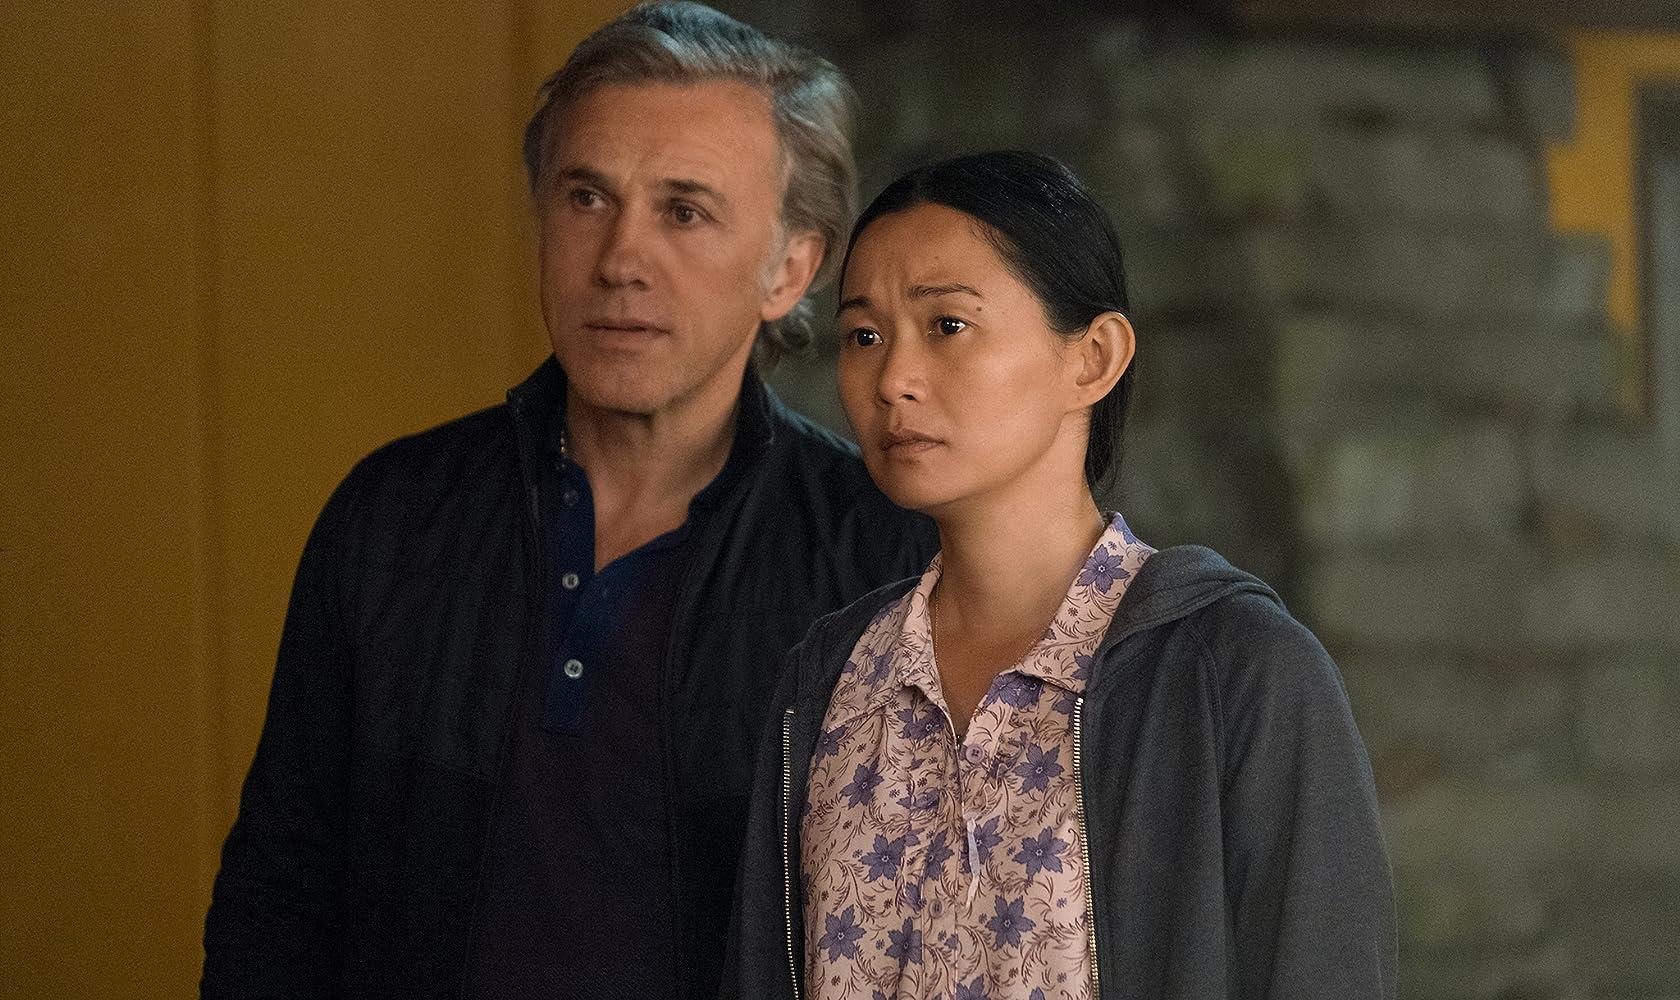 Hong Chau bersama Christoph Waltz